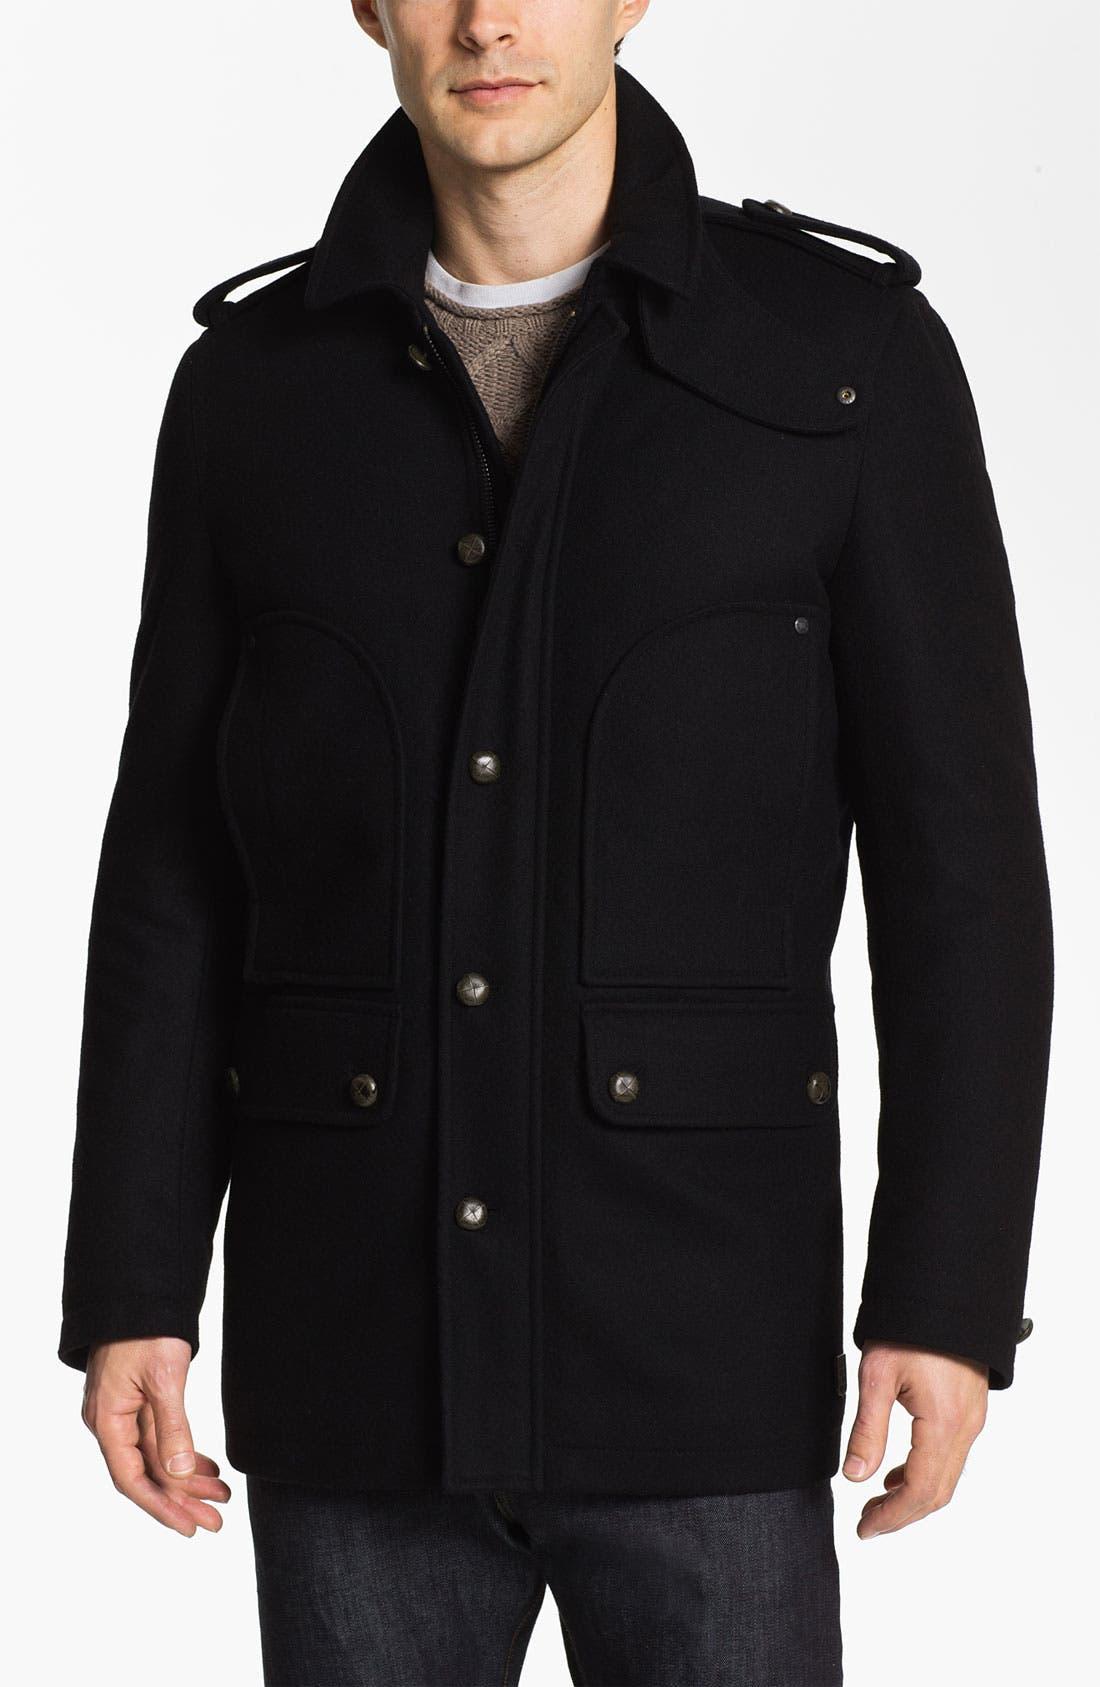 Main Image - Vince Camuto Wool & Cashmere Blend Car Coat